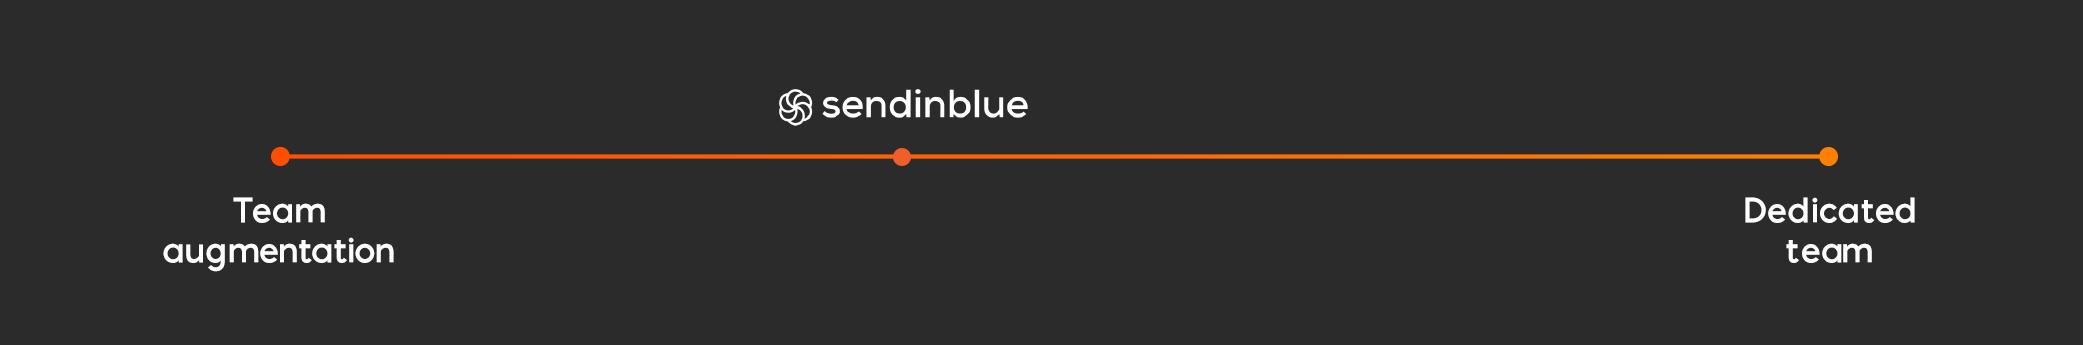 Sendinblue mixed IT outsourcing model